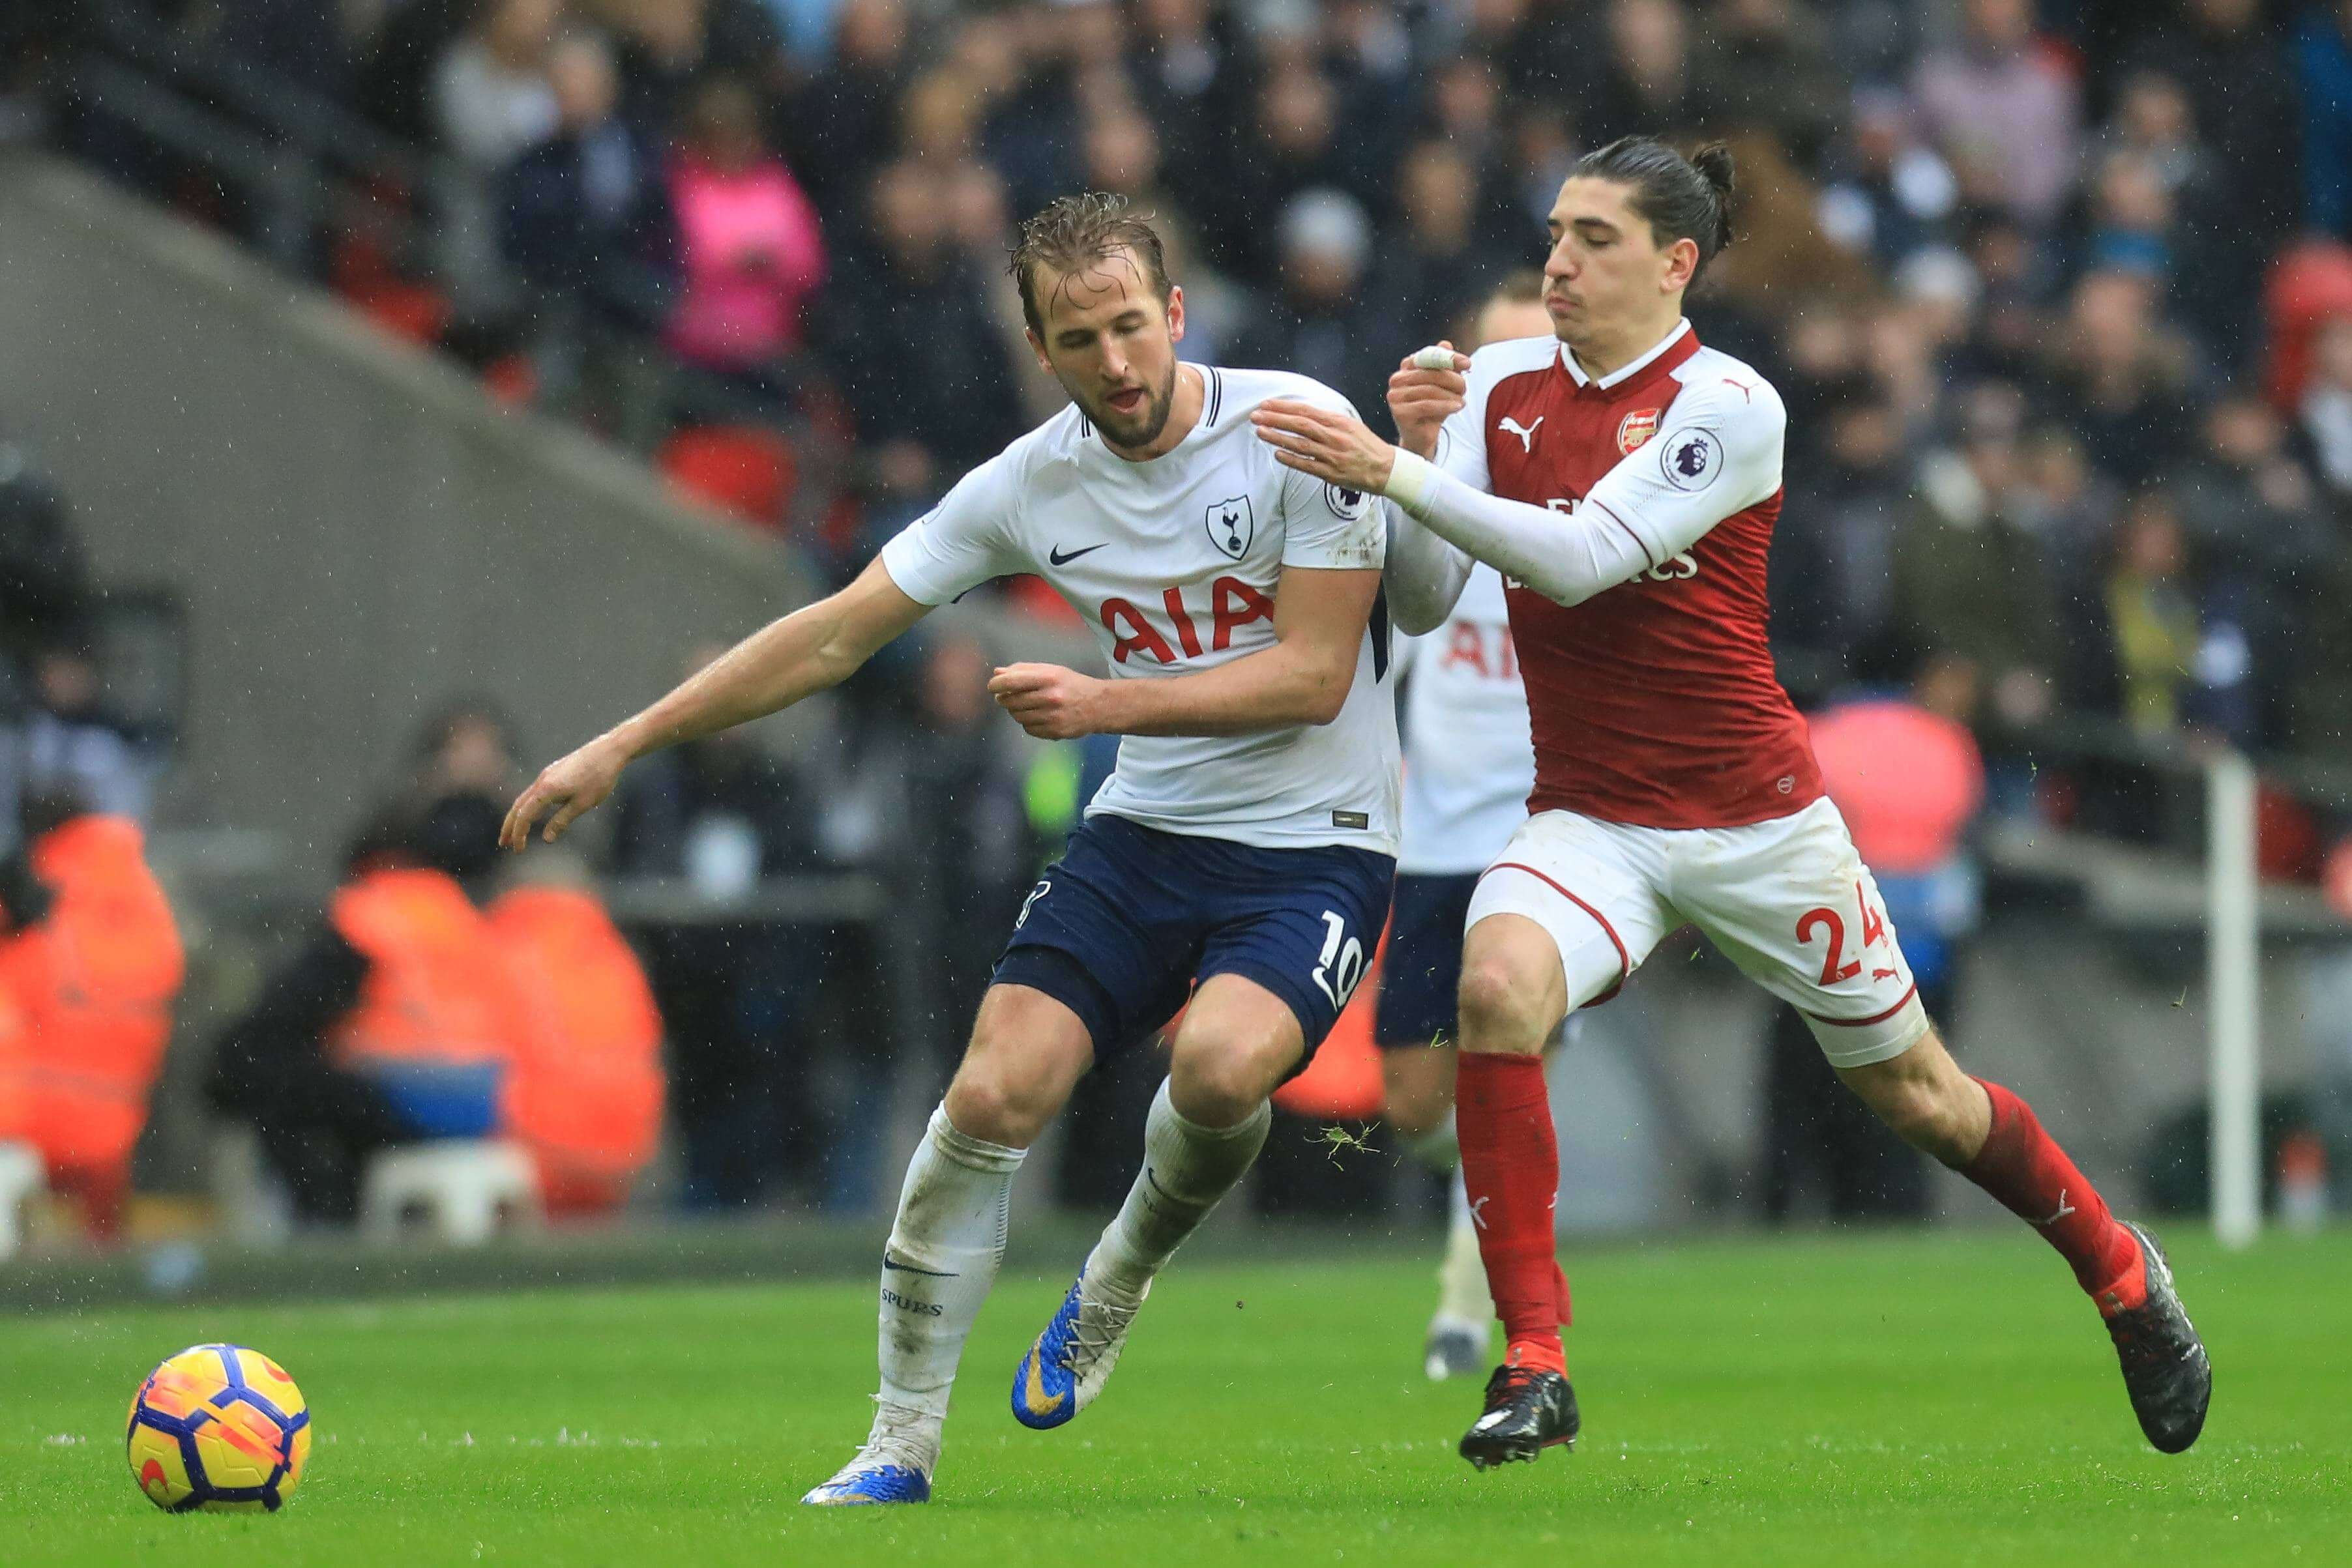 Arsenal vs Tottenham live stream: Where to watch the North